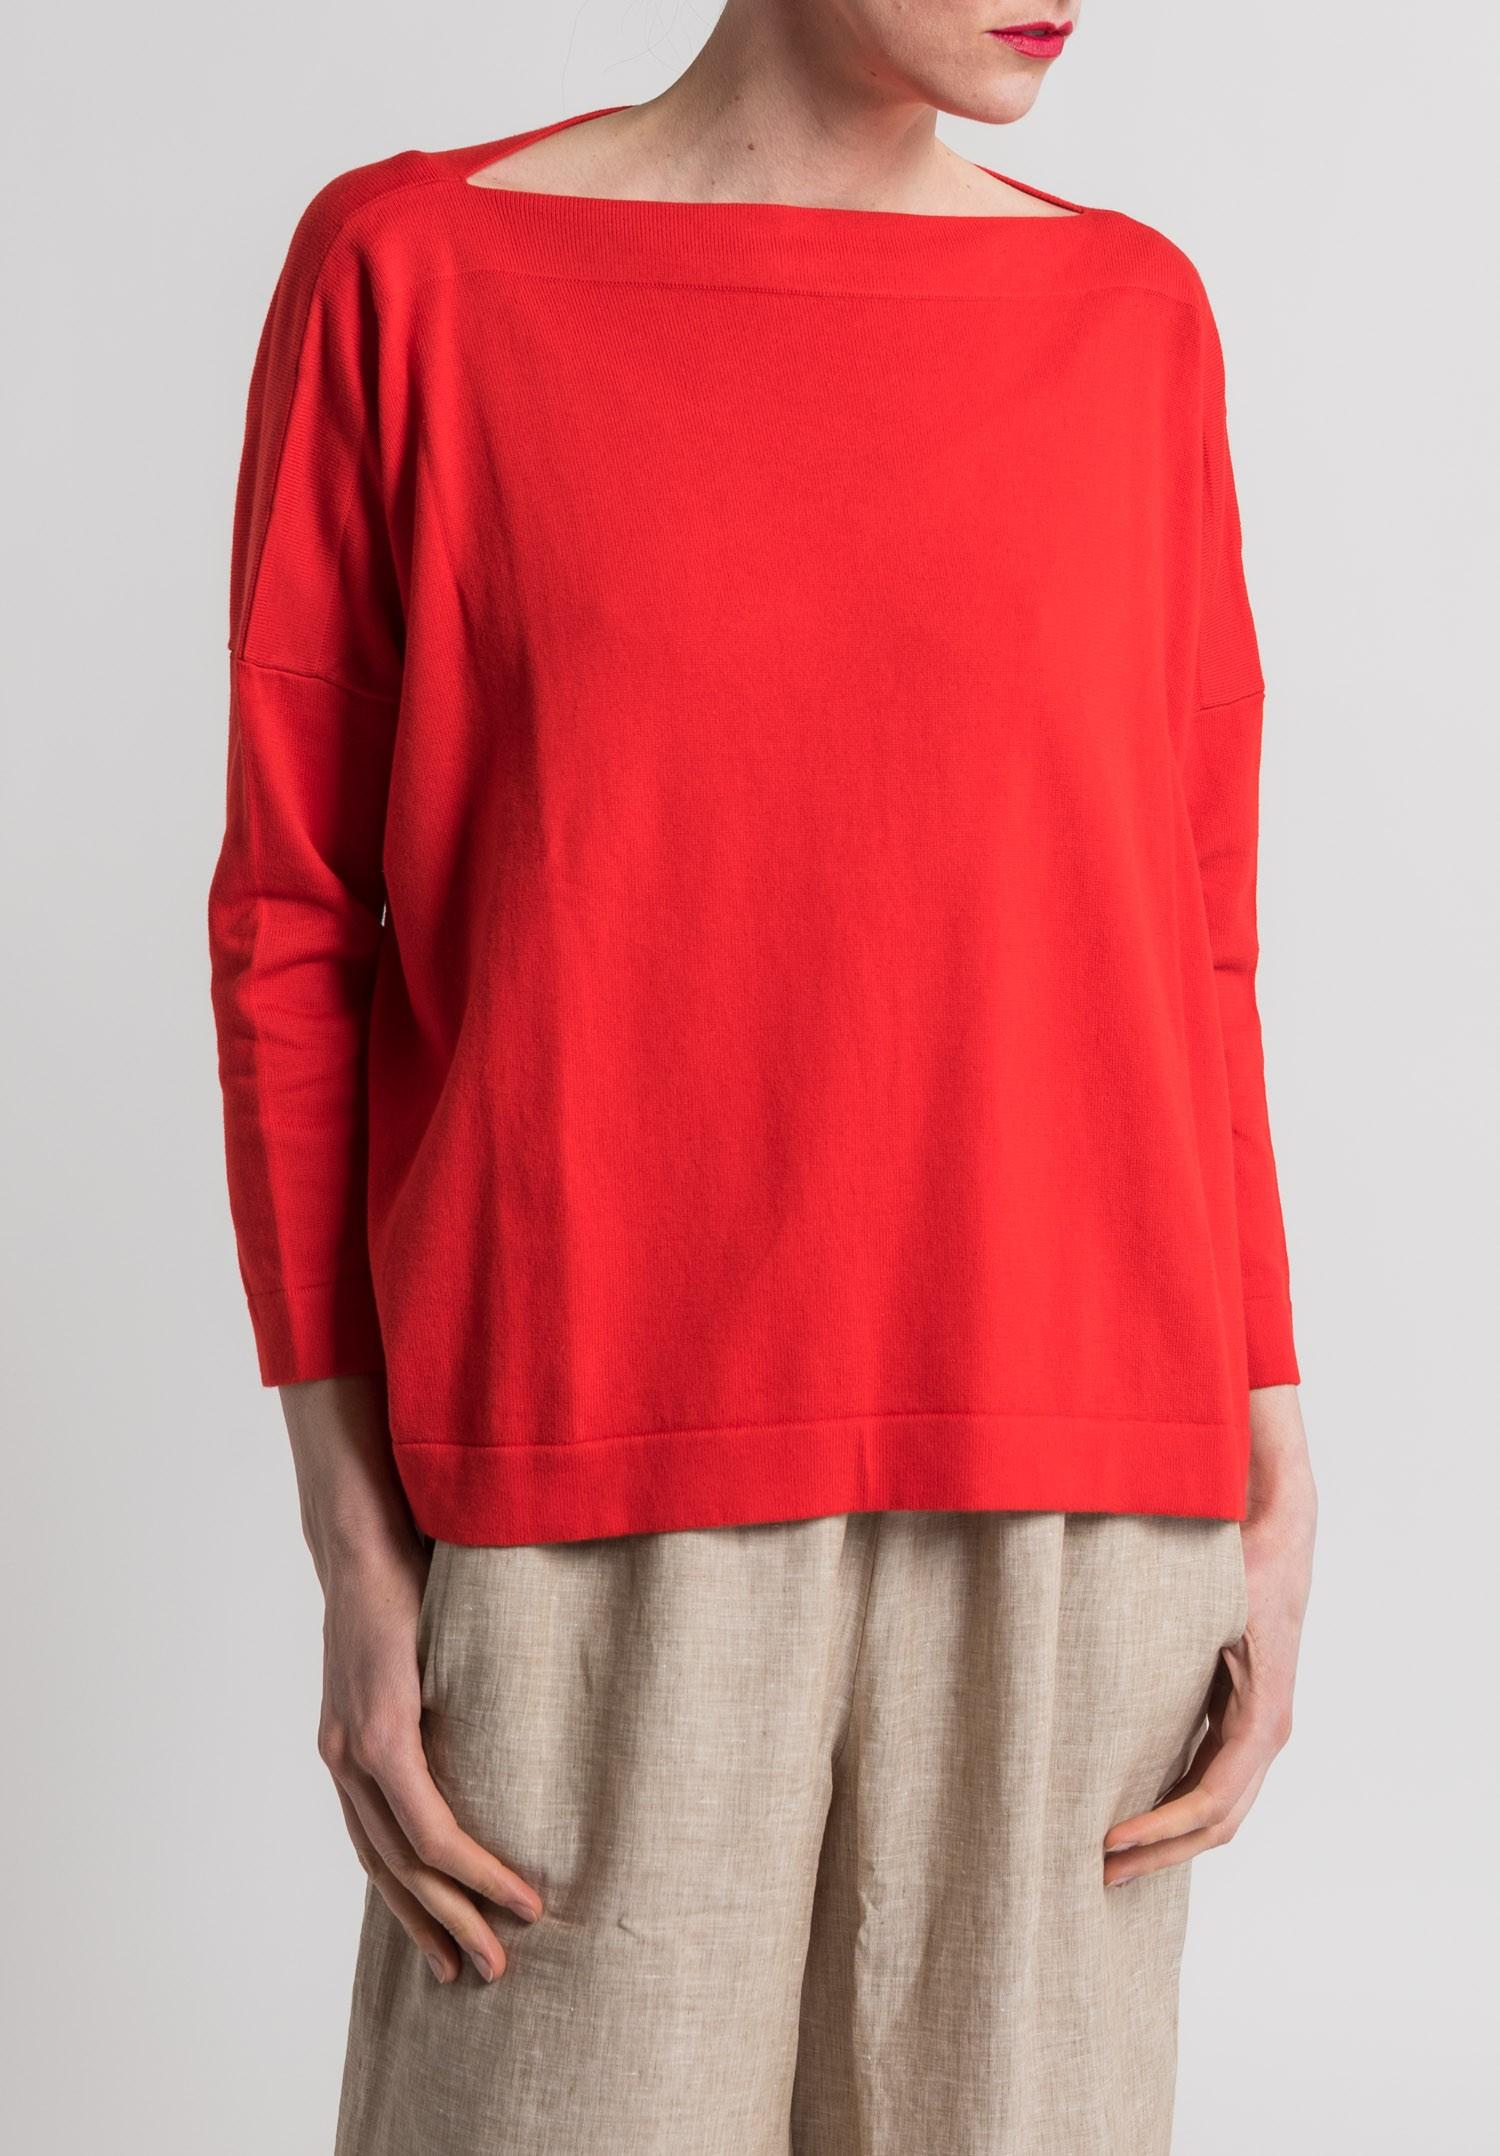 Daniela Gregis Cotton Boatneck Sweater in Red | Santa Fe Dry Goods